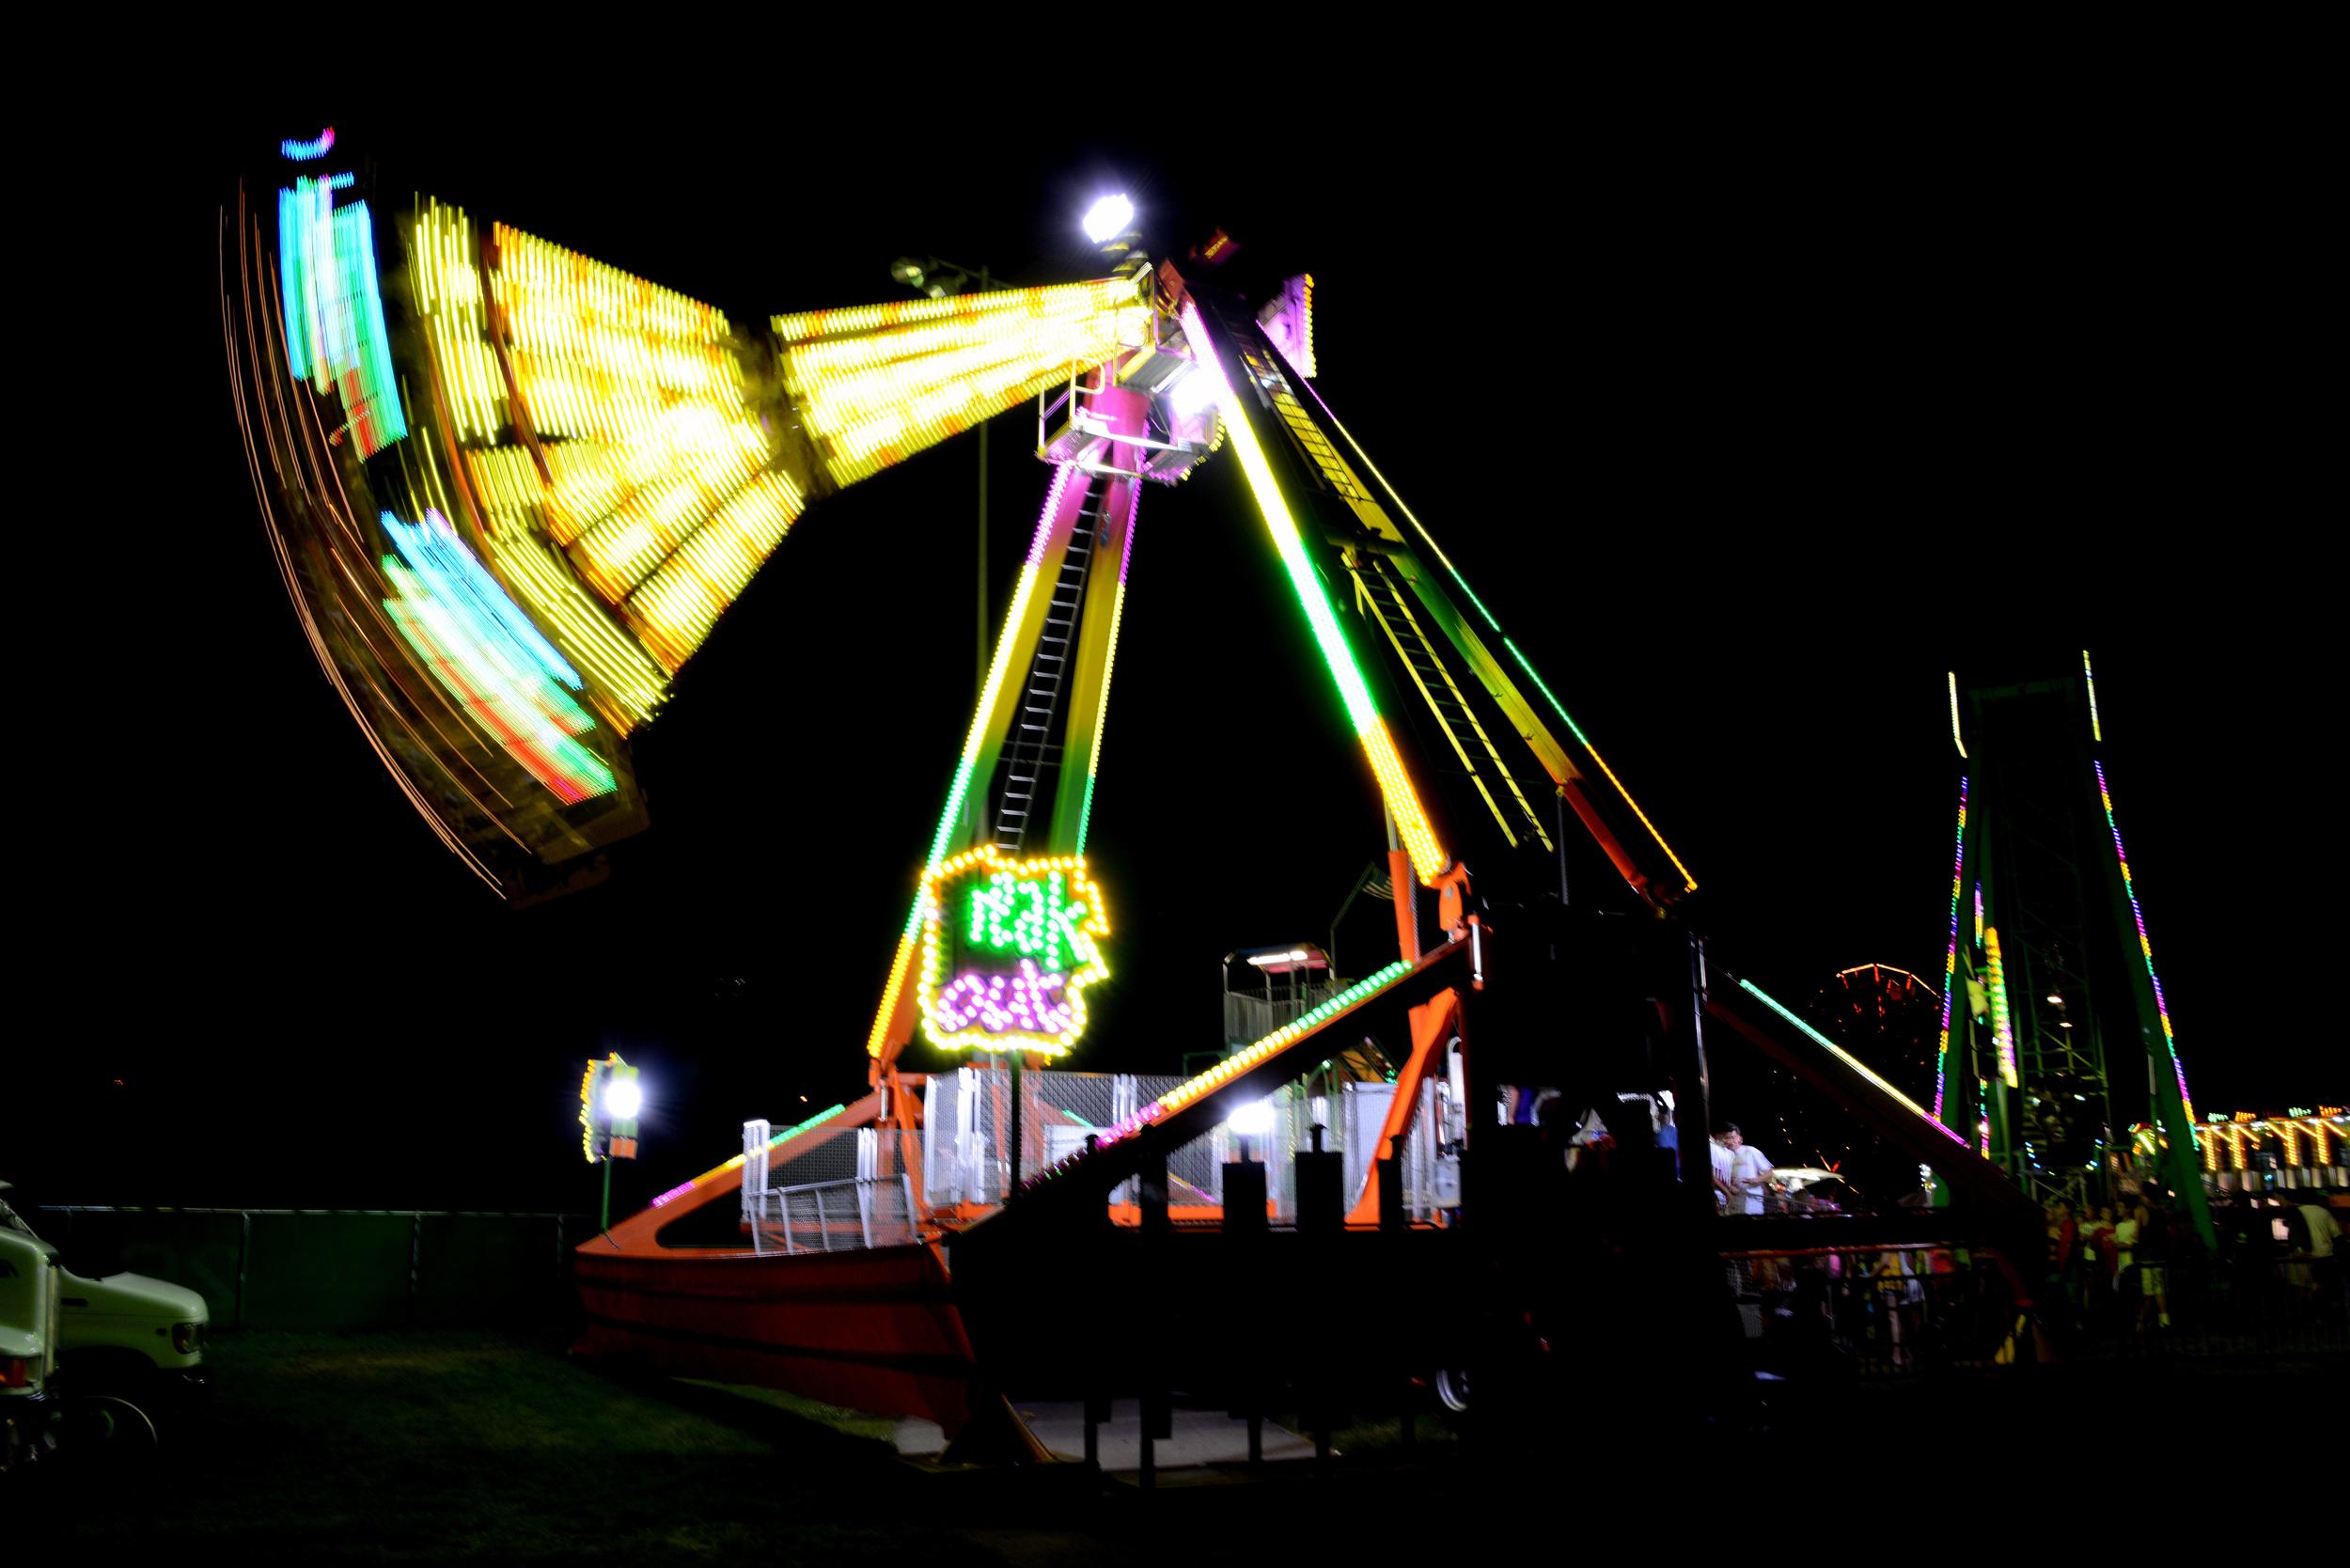 RF2014 - Carnival-009.jpg